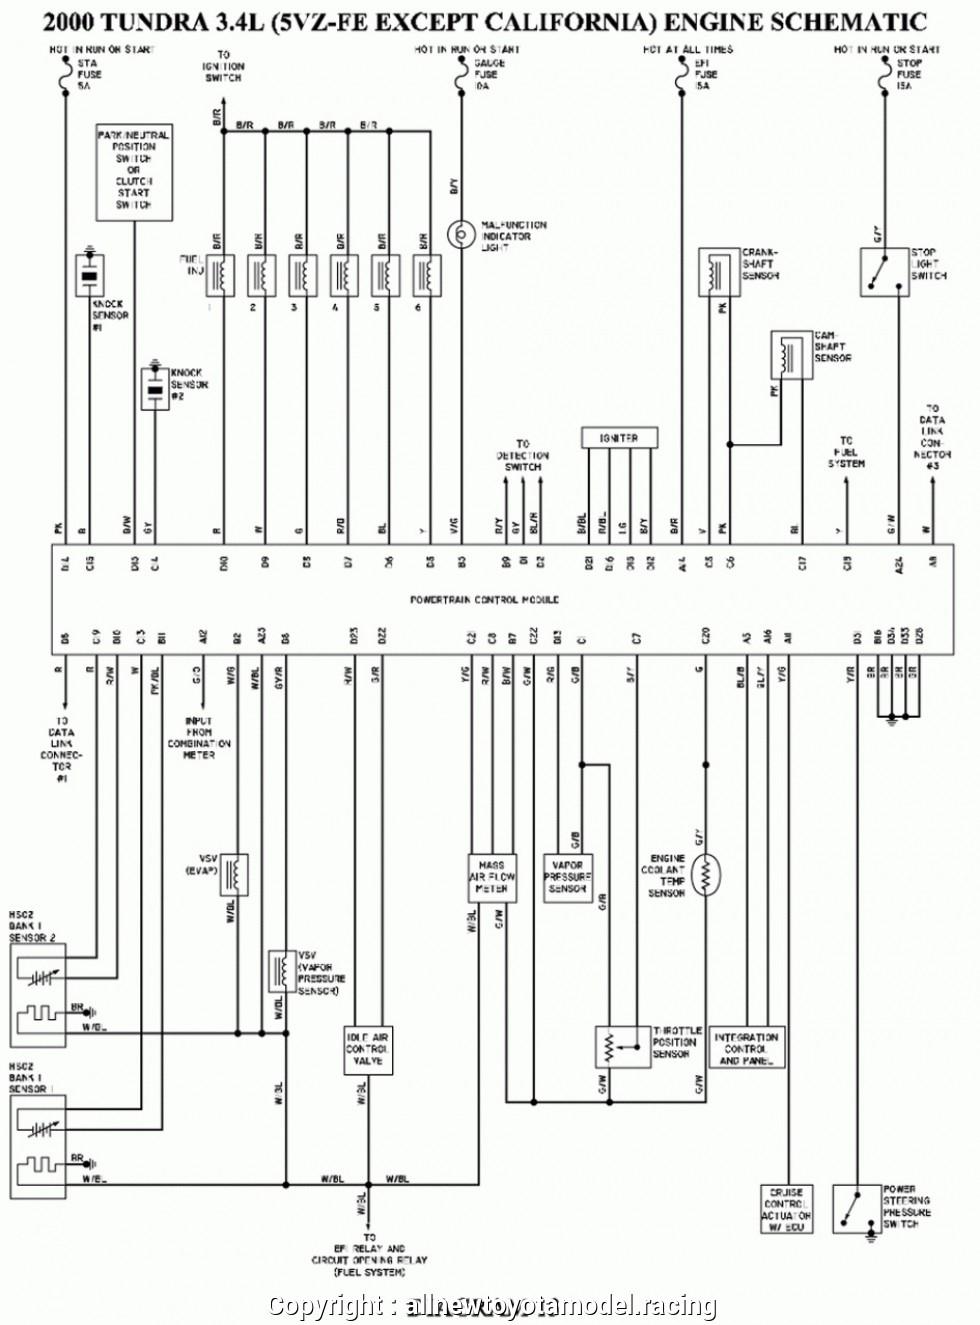 2000 Toyota Tundra Trailer Wiring Diagram